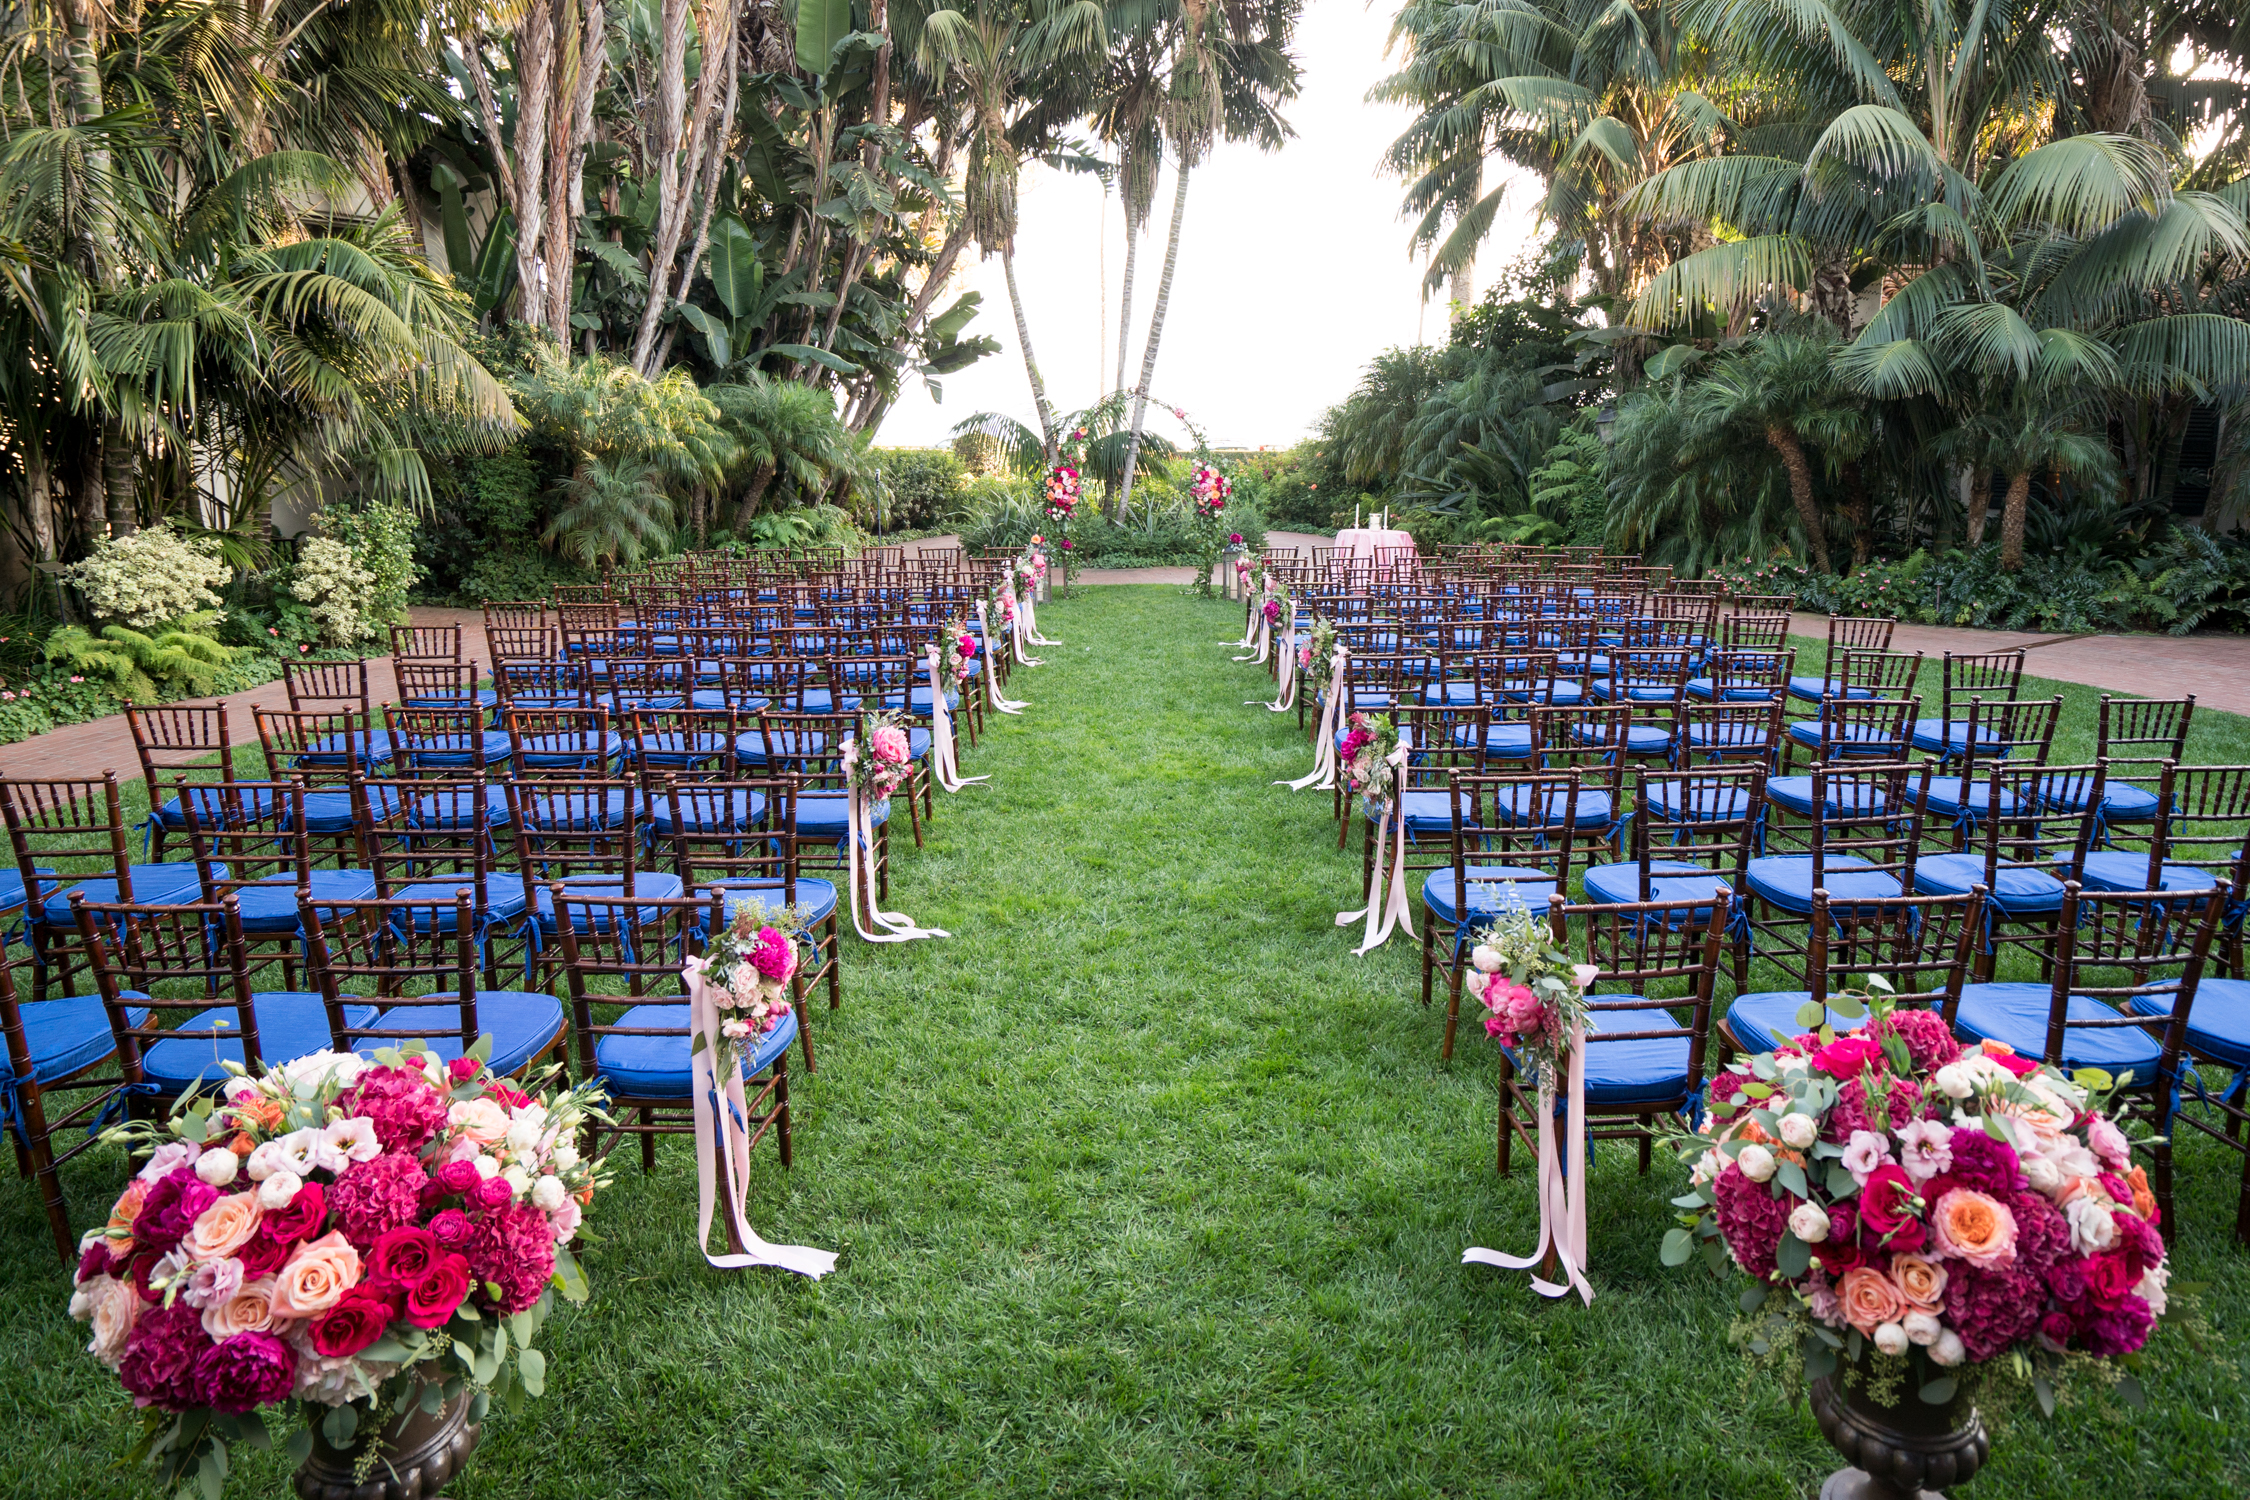 www.santabarbarawedding.com | Miki & Sonja Photography | Four Seasons Resort The Biltmore | Imagine Weddings & Special Events | Rockrose Floral Design | Ceremony Set Up